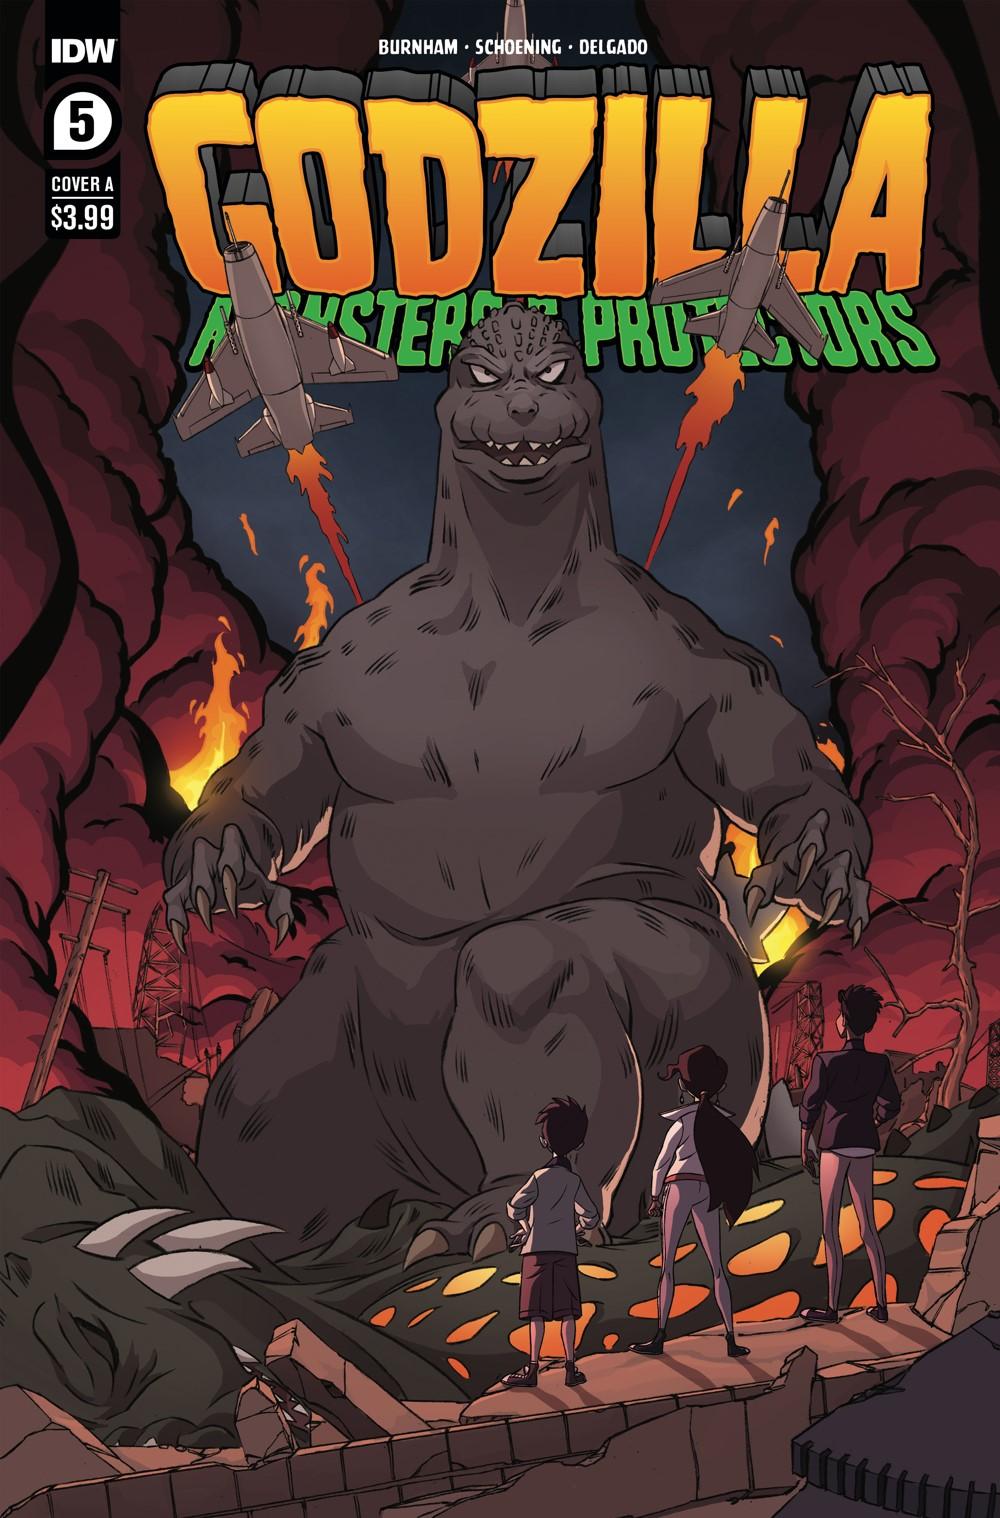 Godzilla_MP05-coverA ComicList Previews: GODZILLA MONSTERS AND PROTECTORS #5 (OF 5)